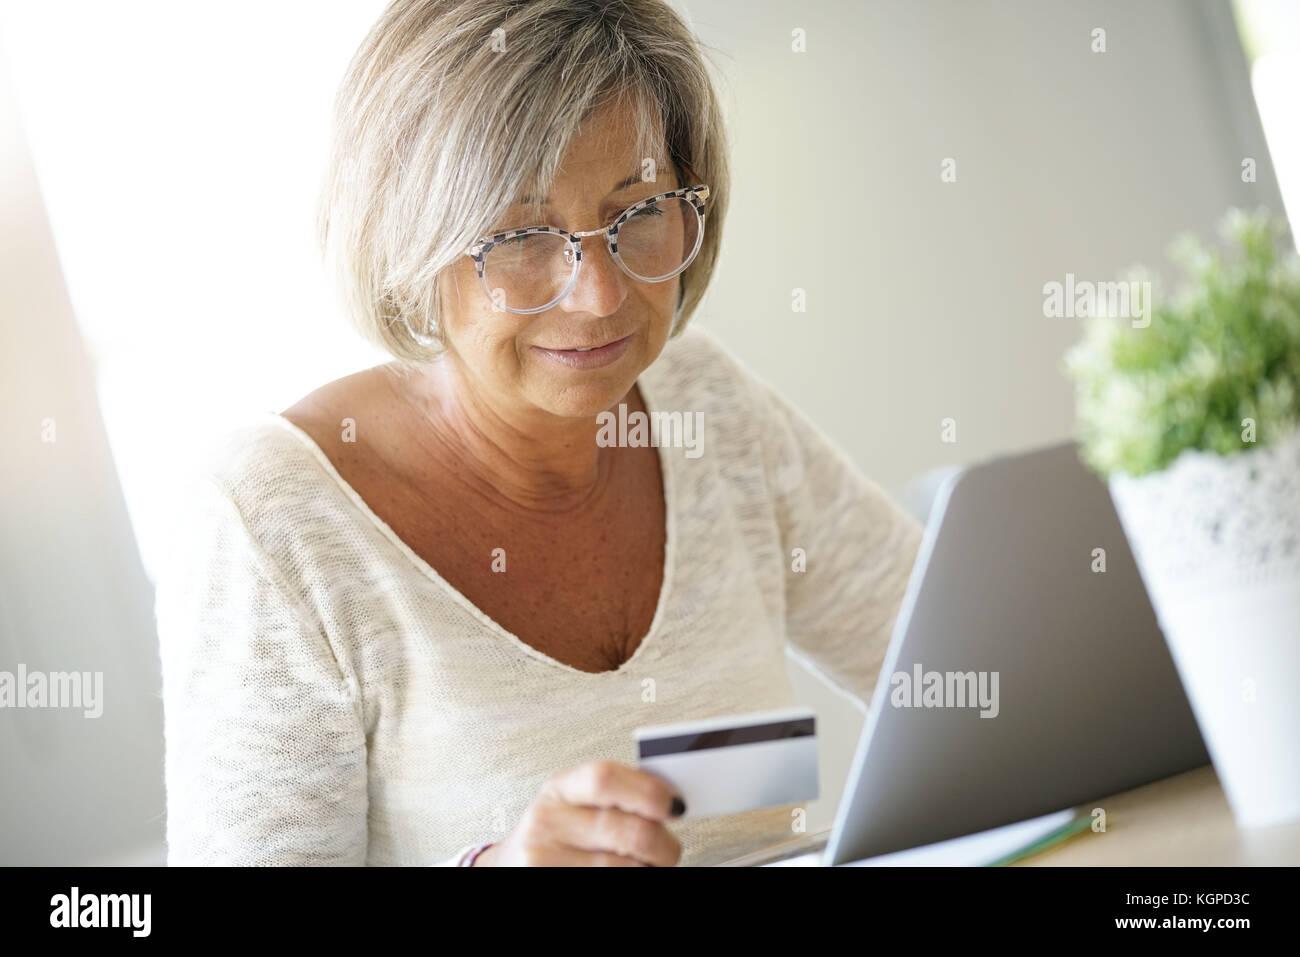 Ältere Frau Kauf im Internet mit Kreditkarte Stockbild